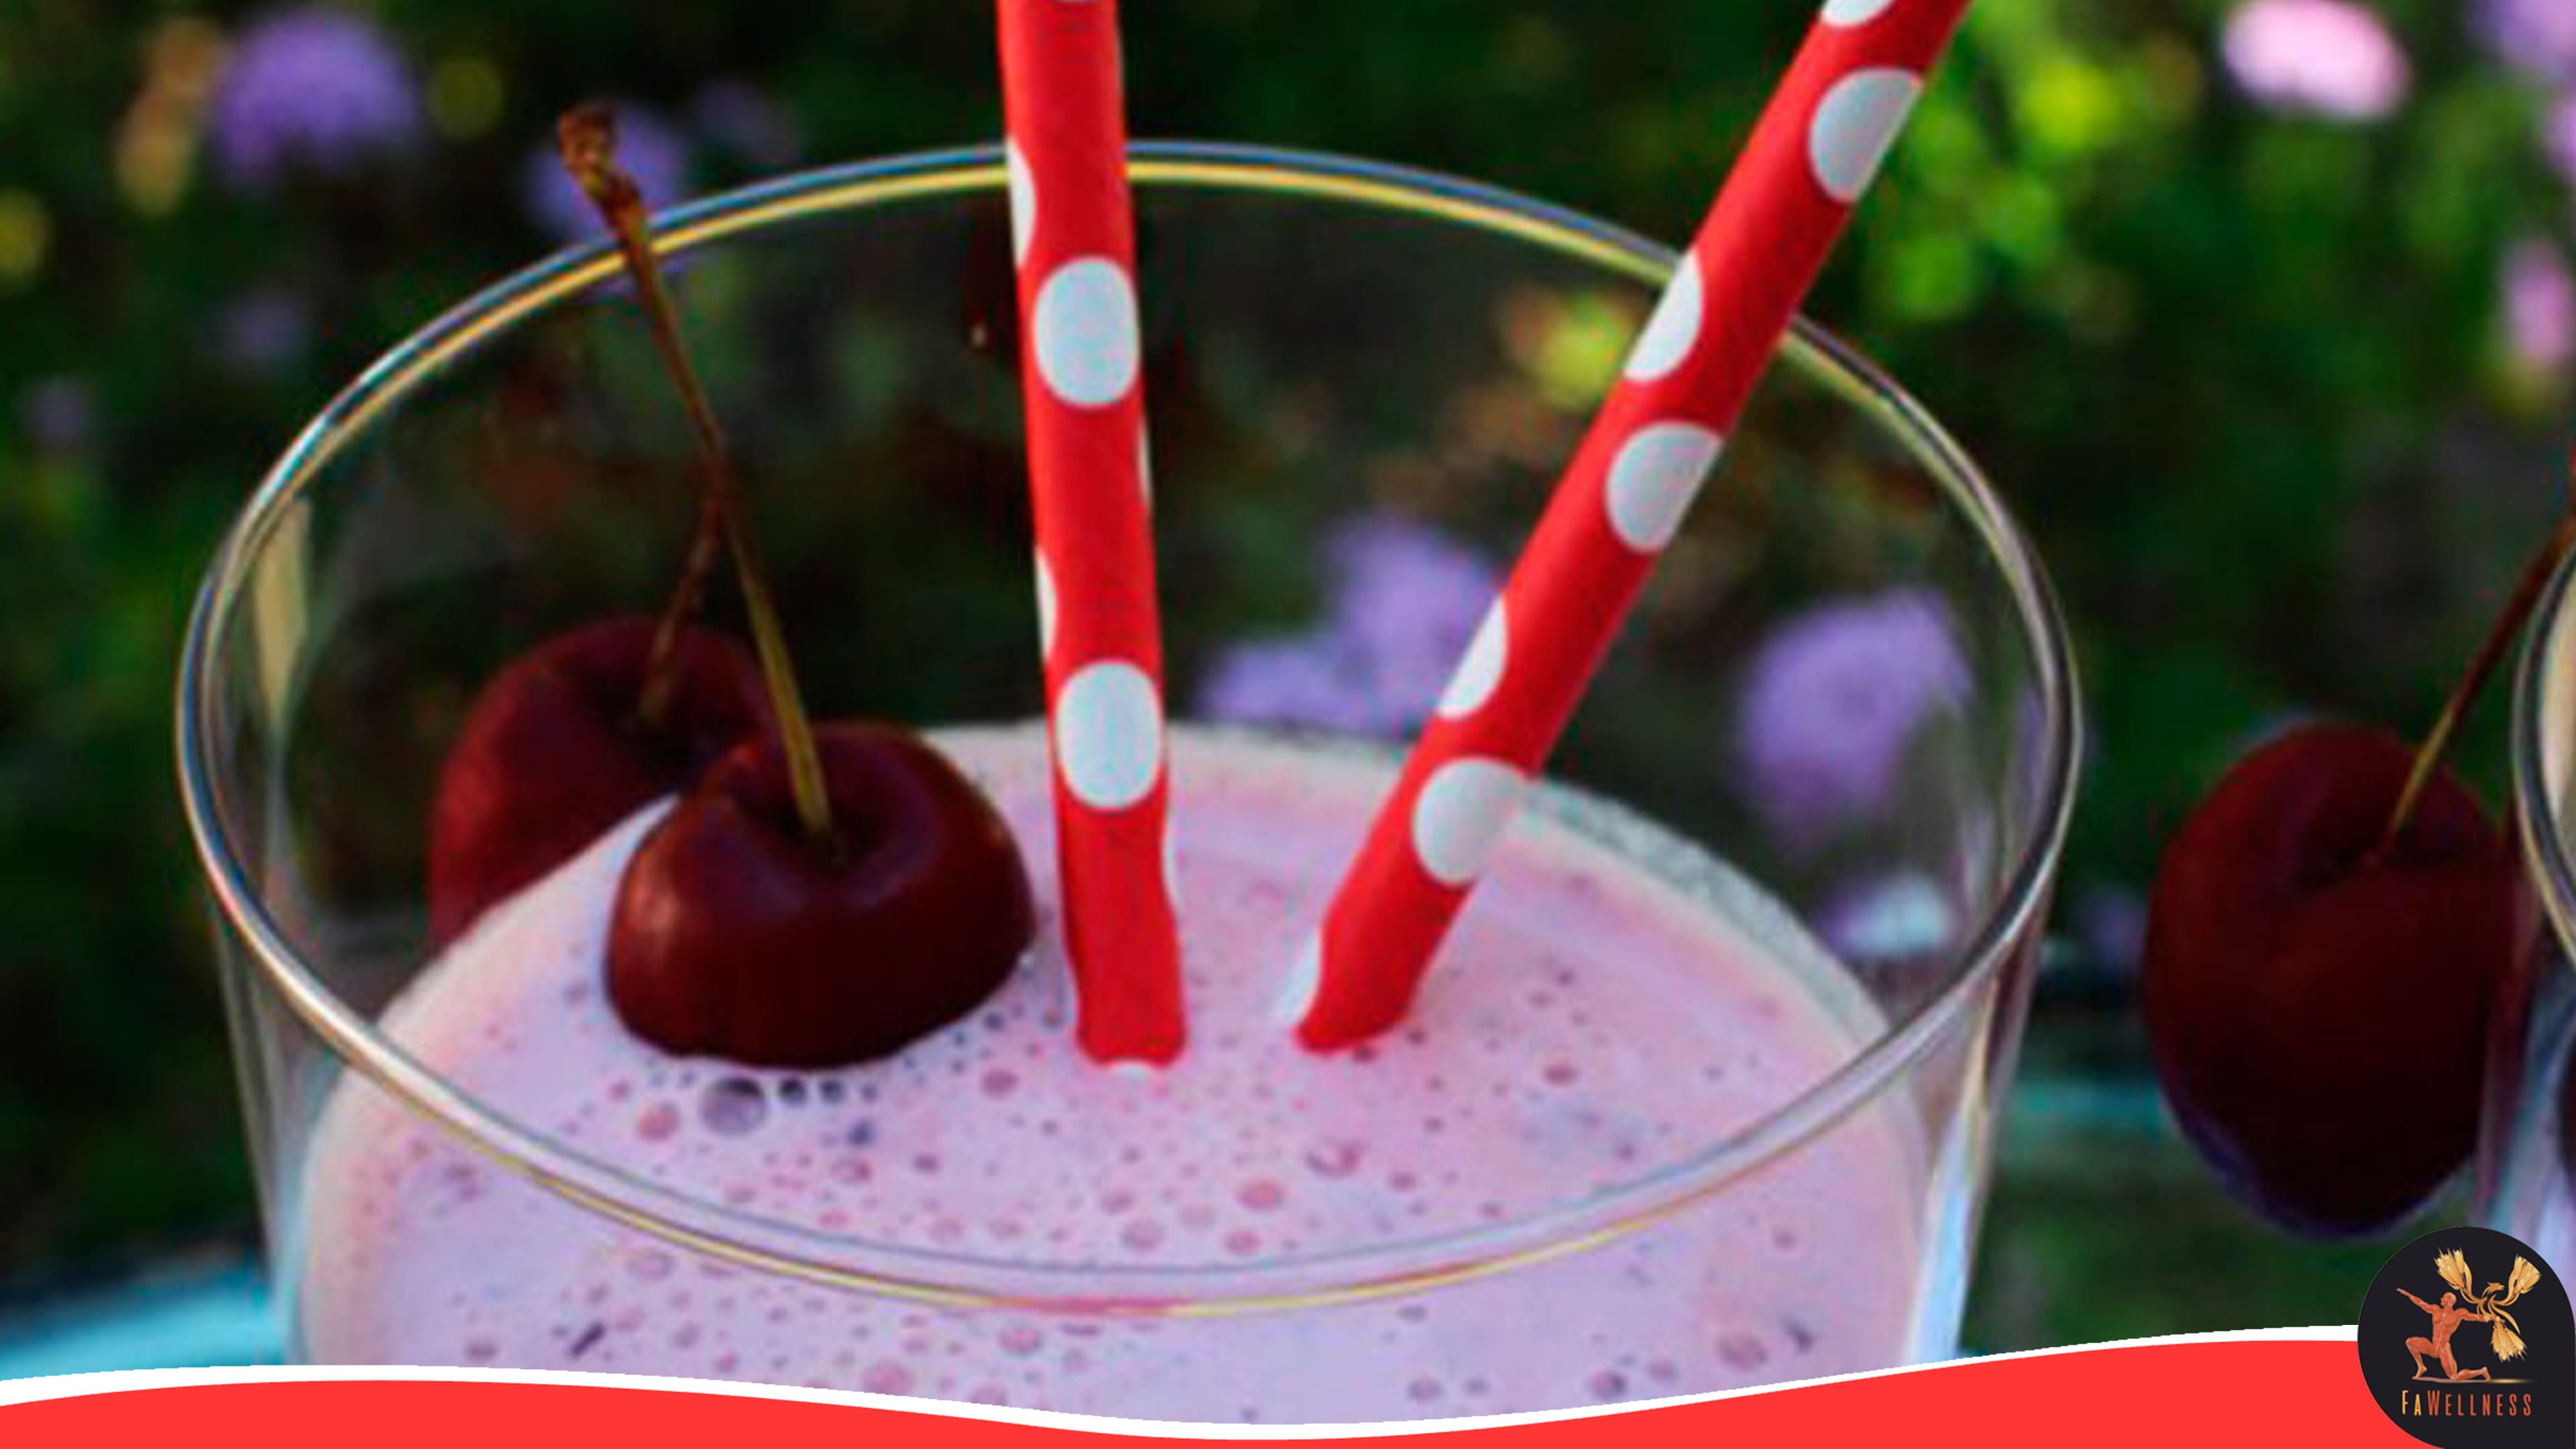 imagen blog FaWellness | Batido de cereza con chocolate